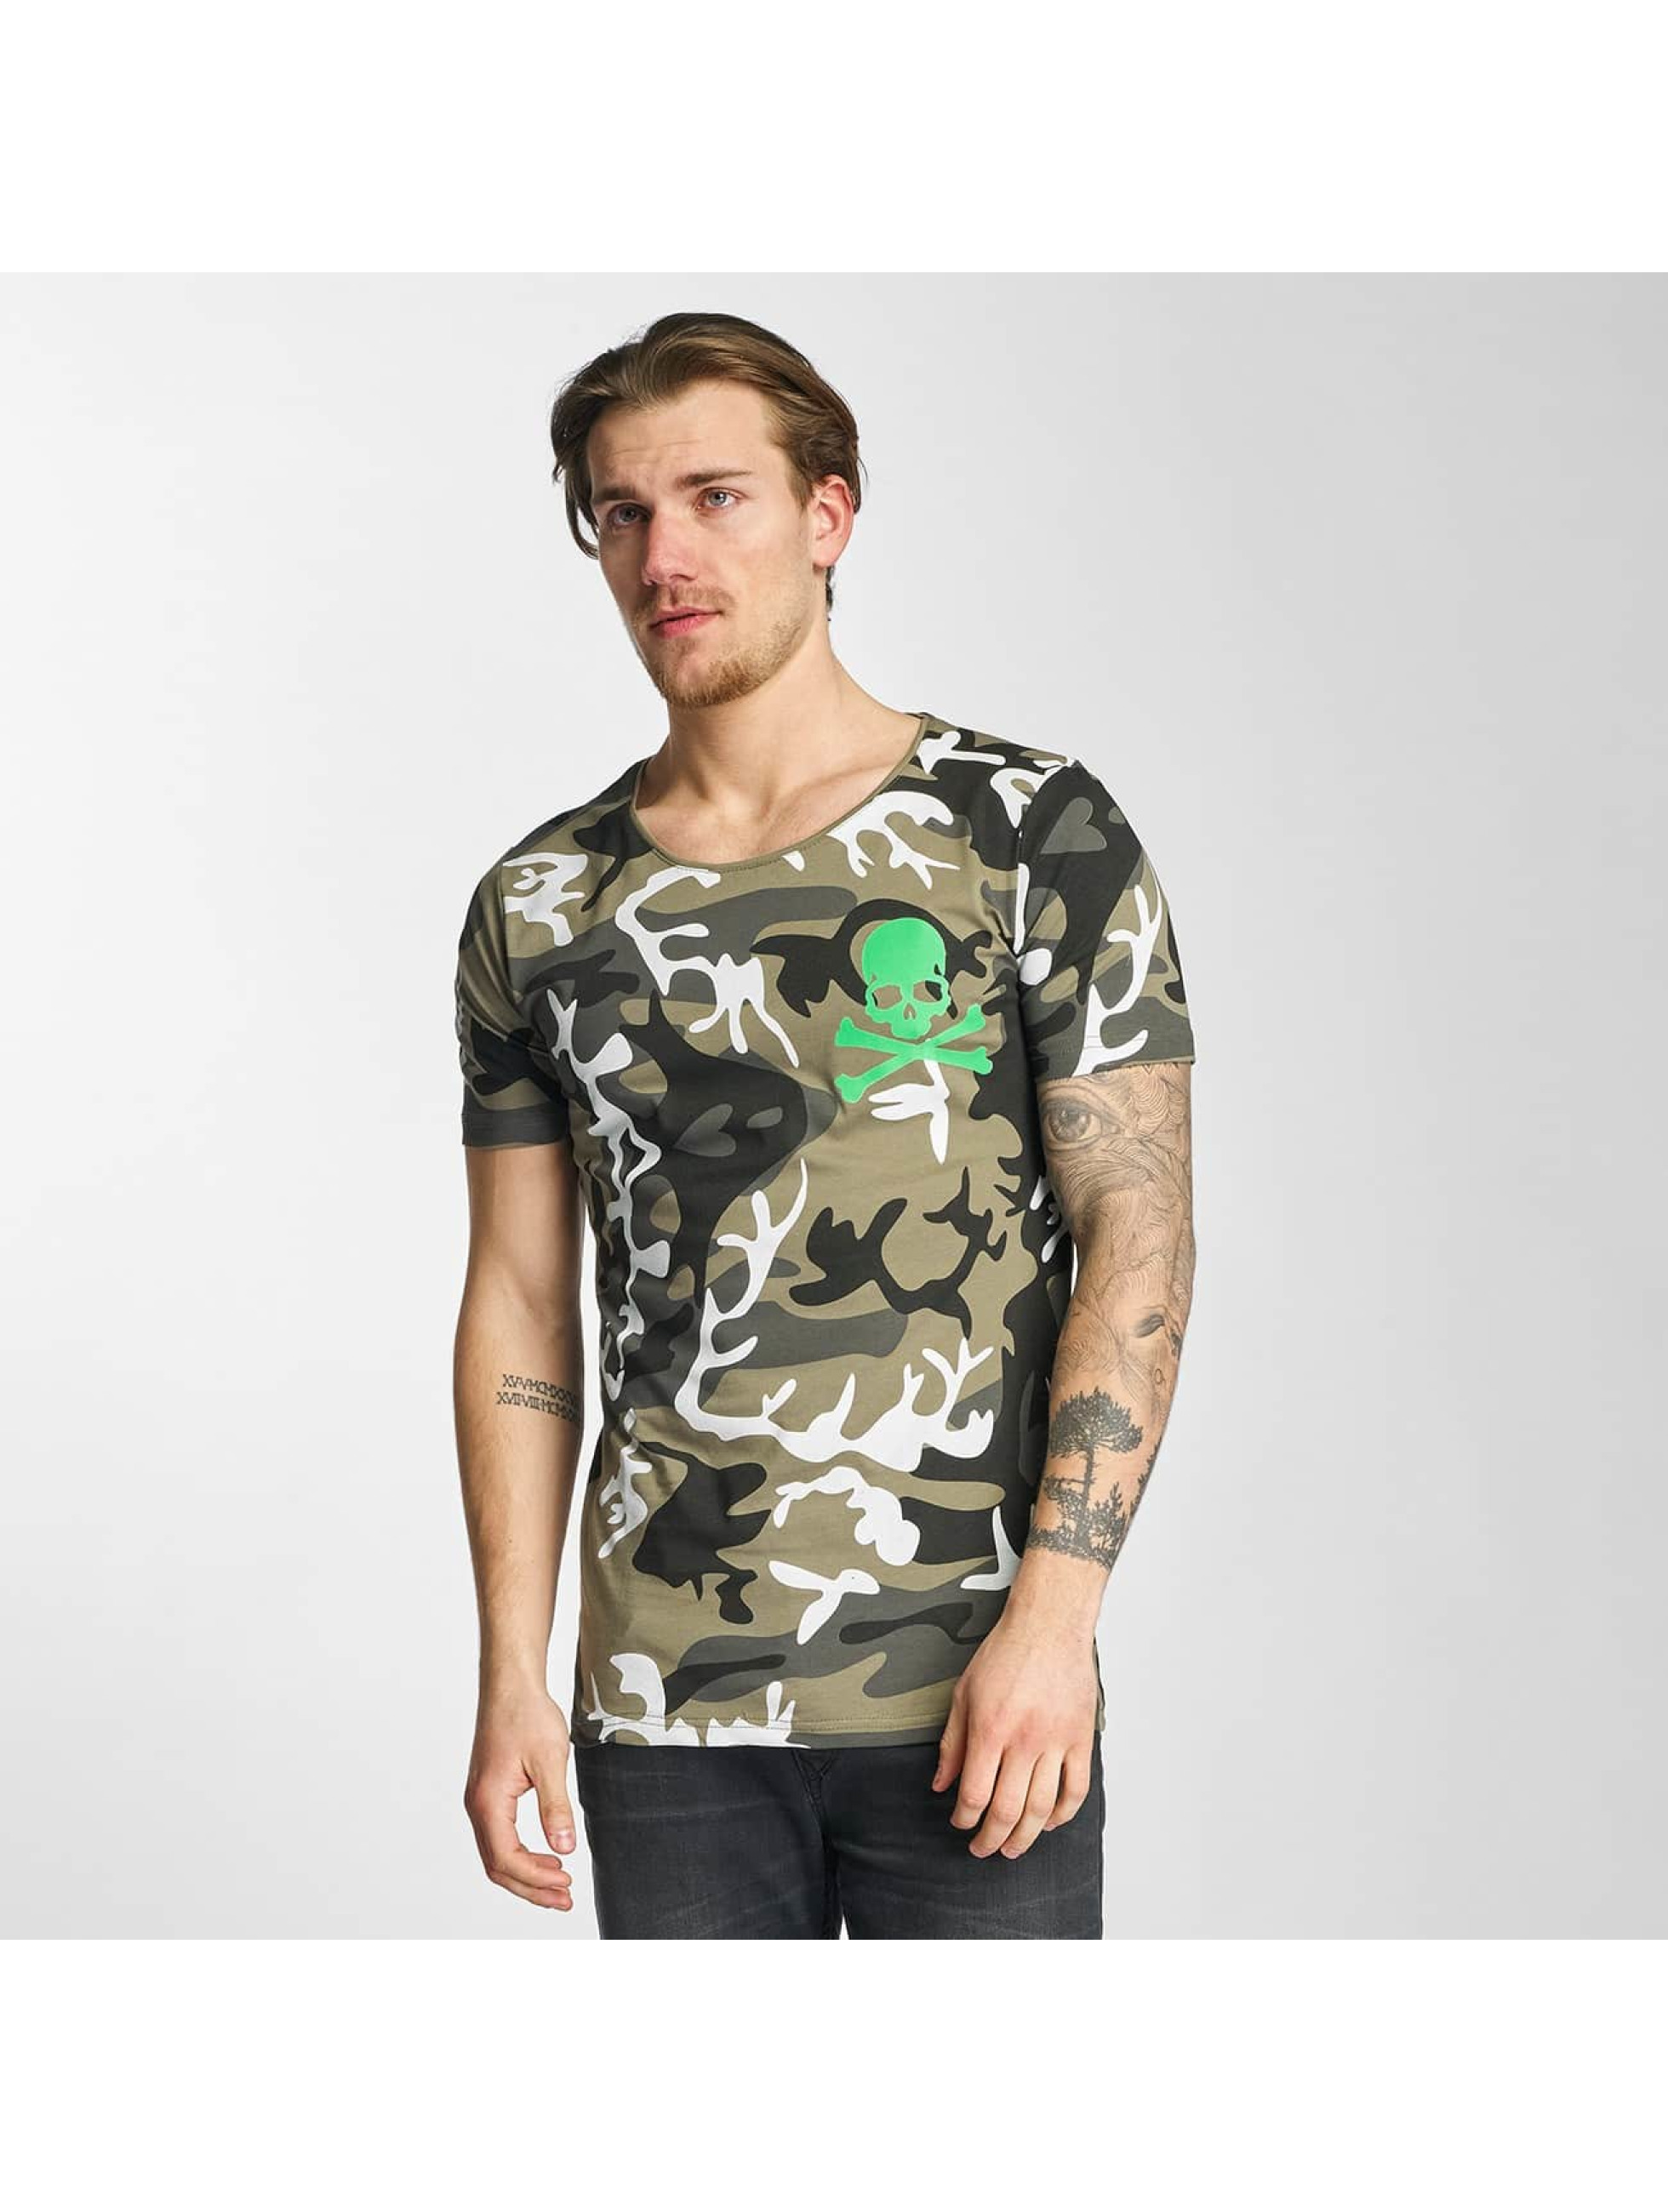 2Y T-shirts Camo khaki